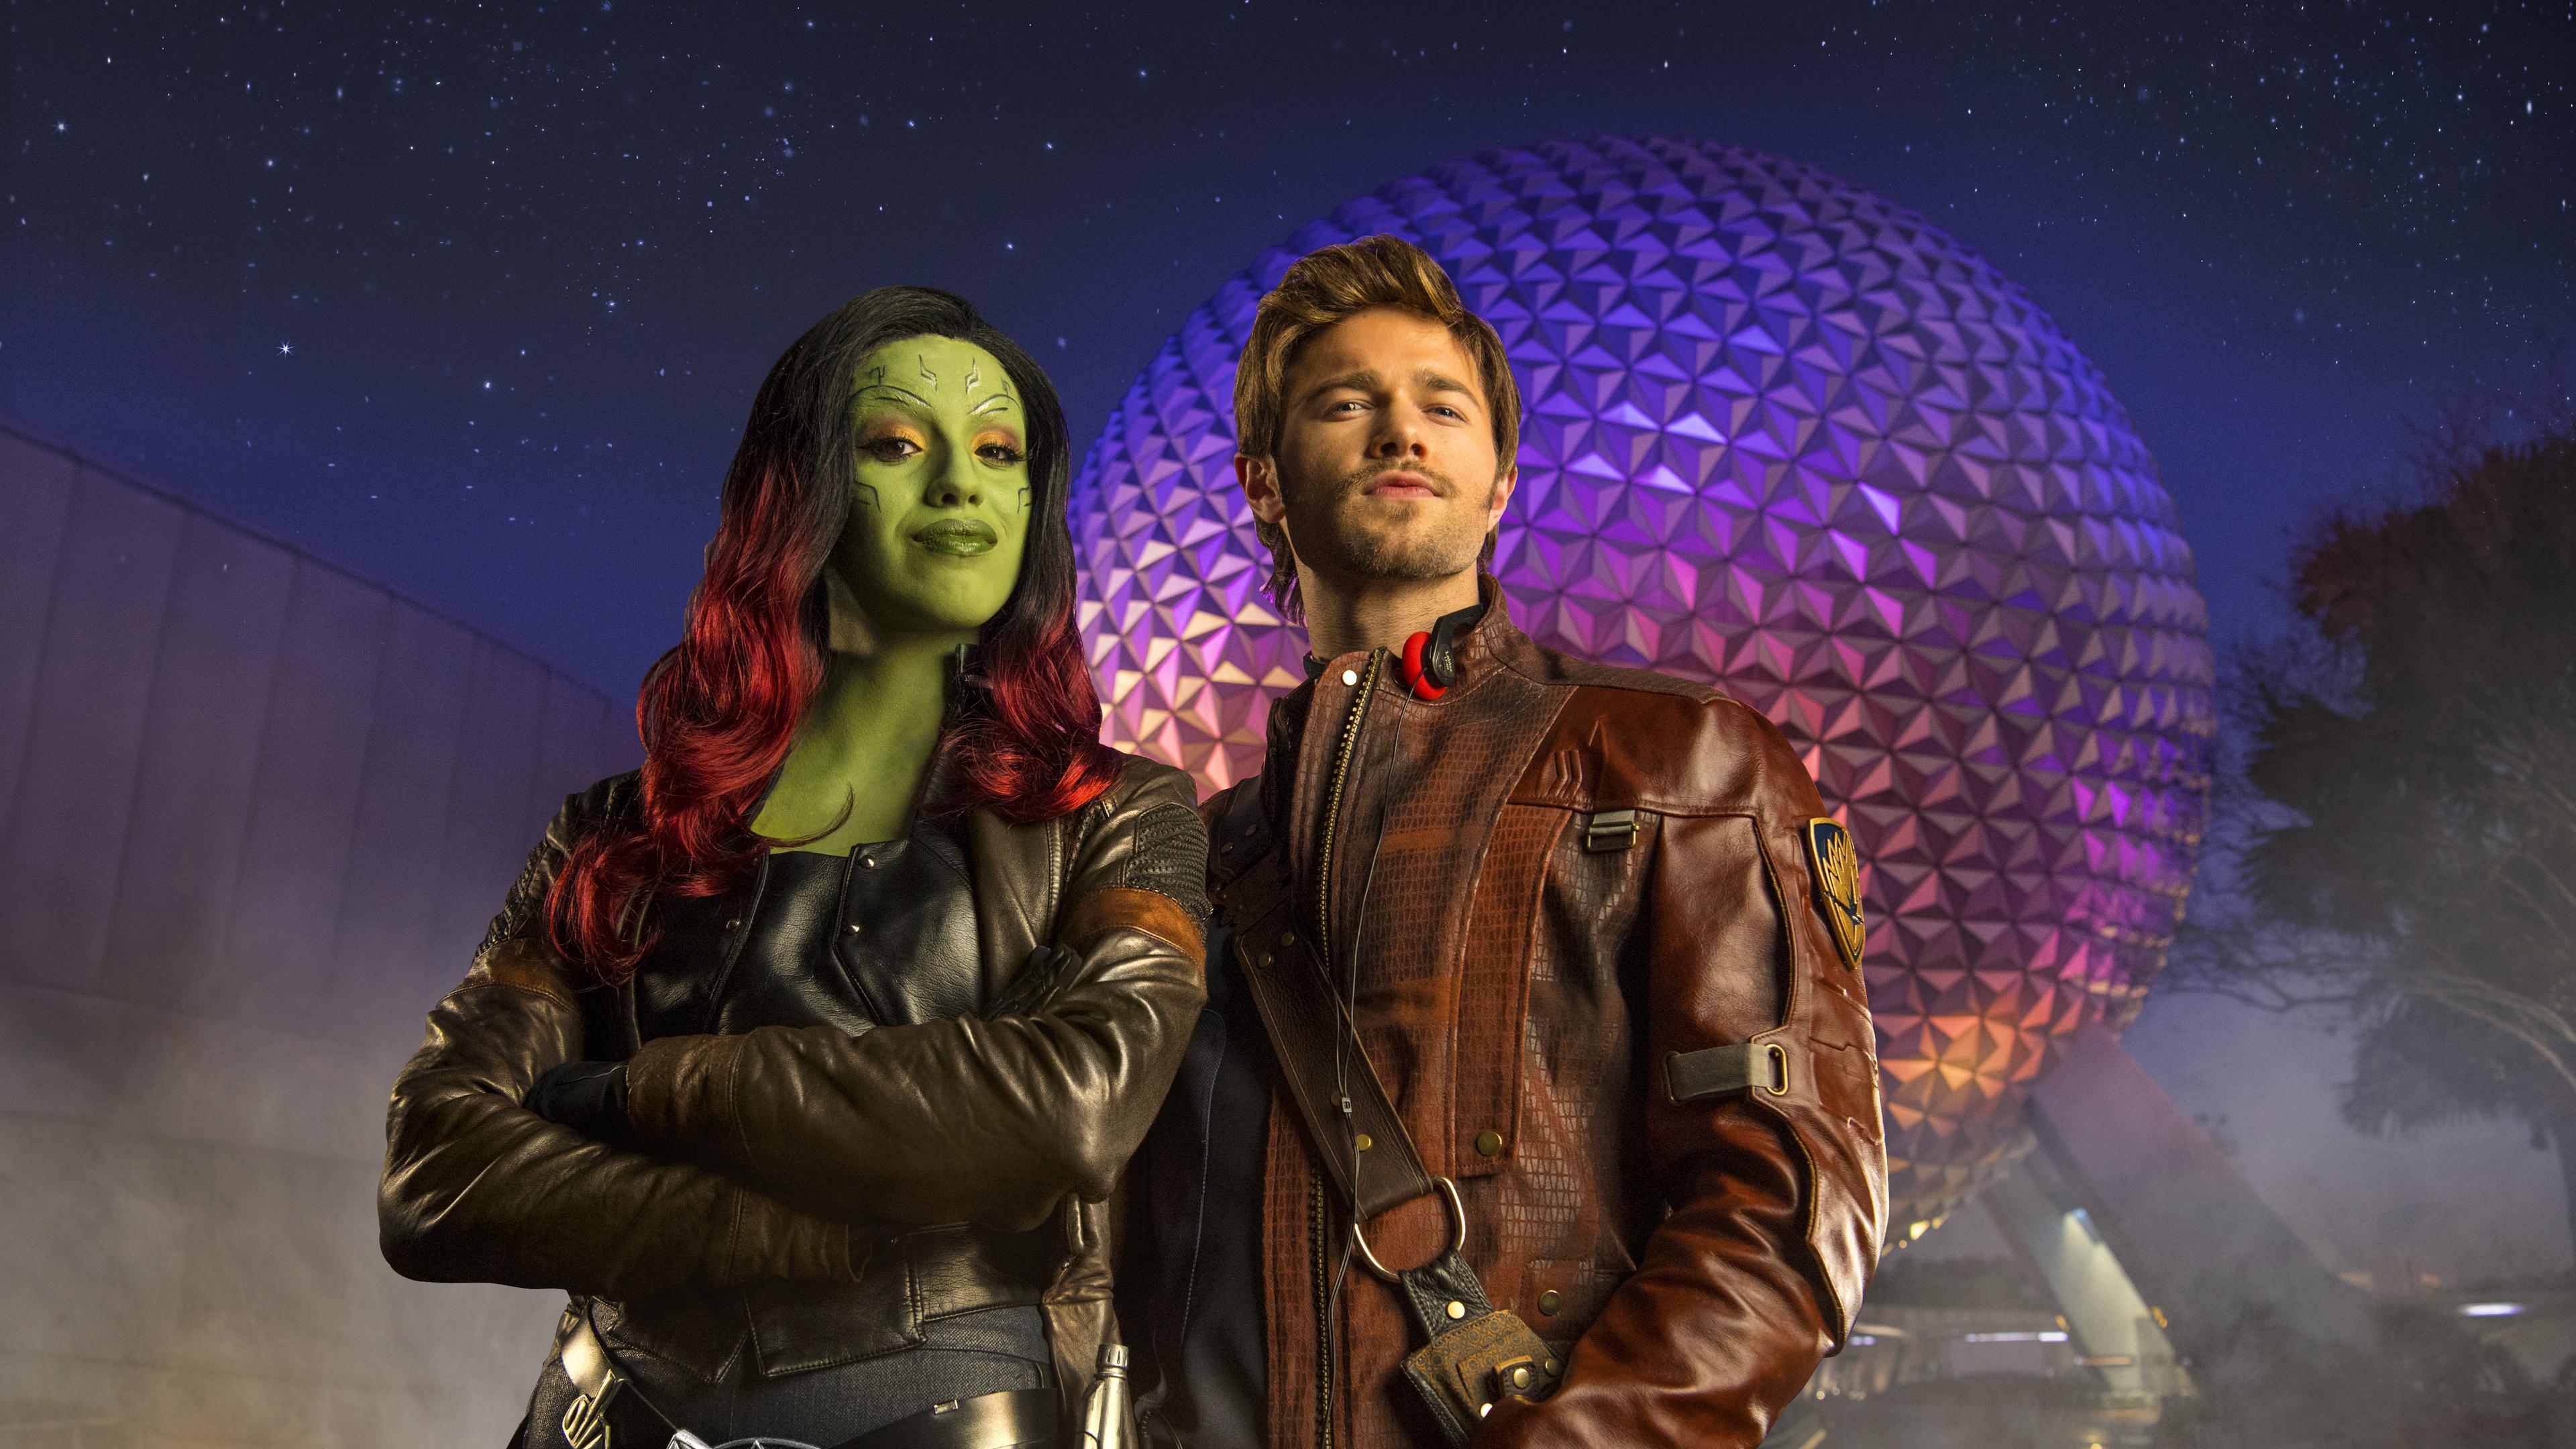 gamora-and-star-lord-cosplay-1v.jpg